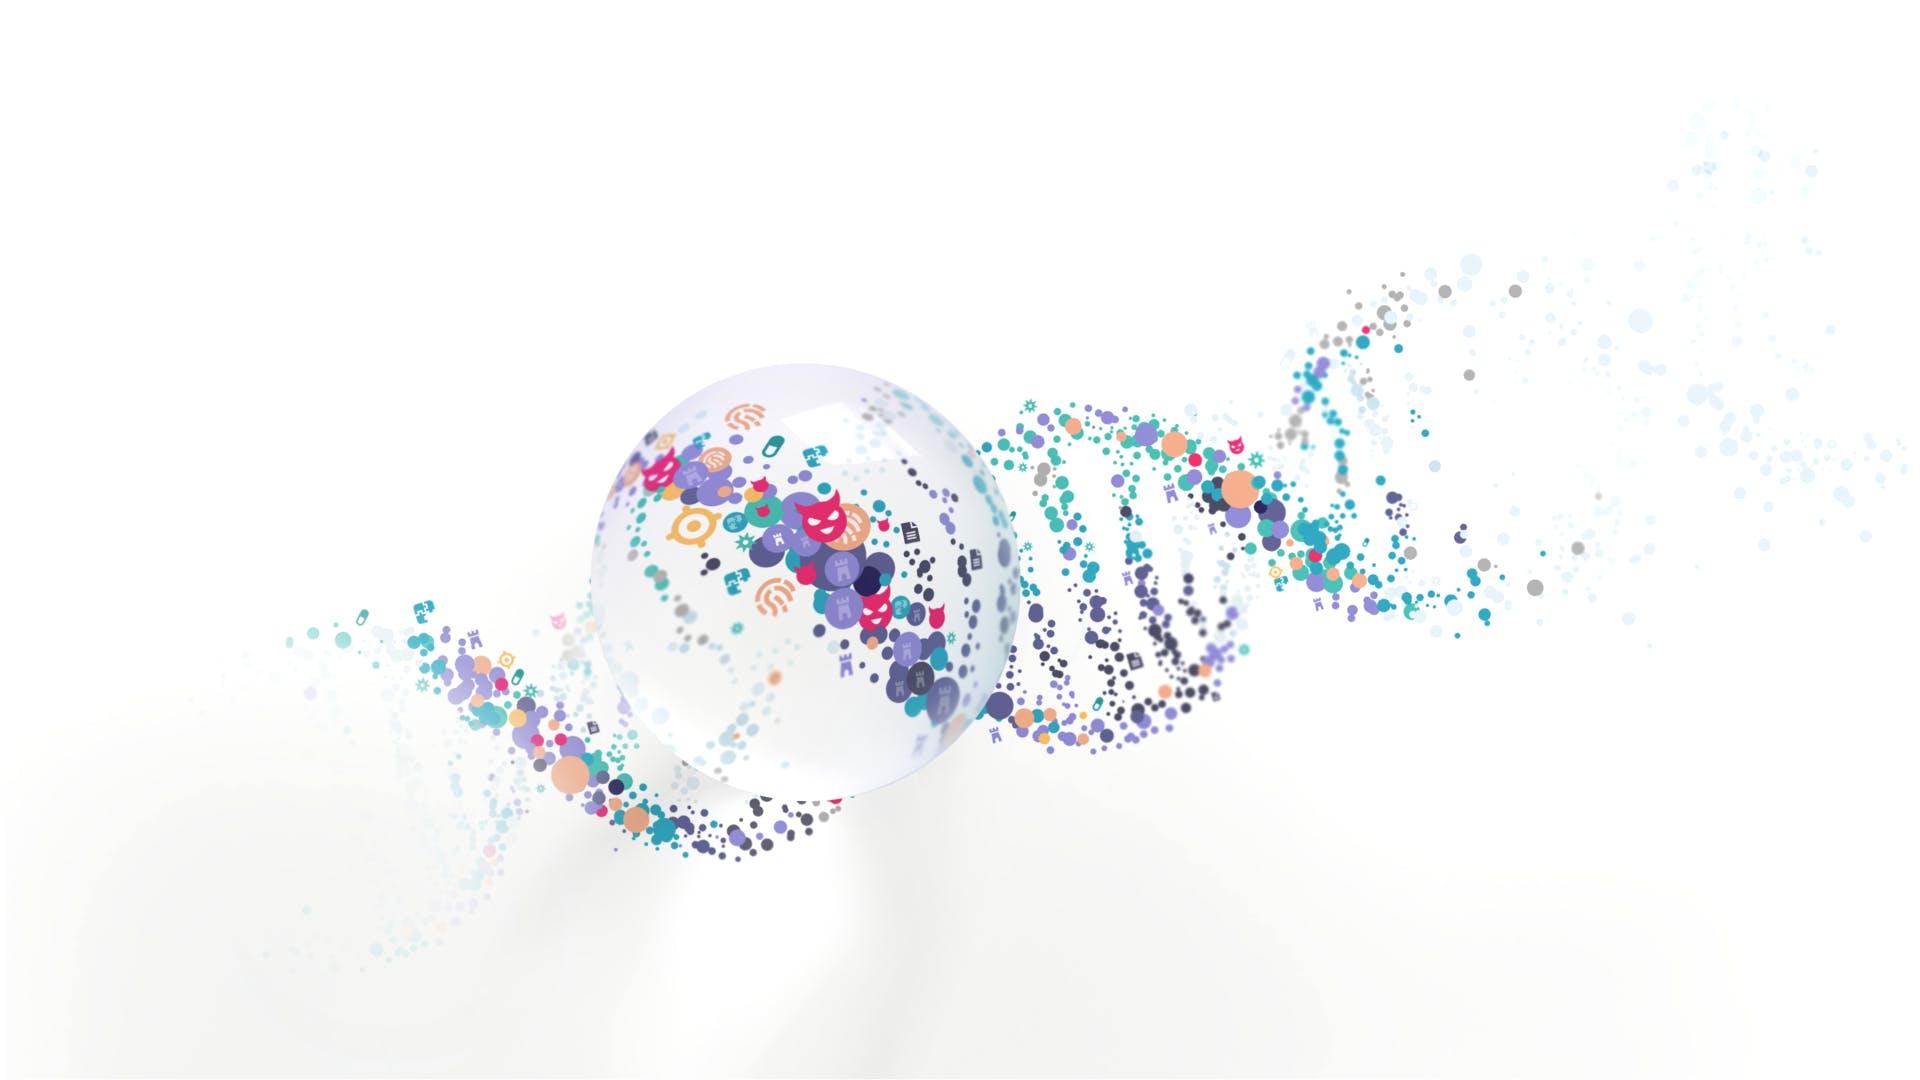 The DNA of CTI - Fusion Center reaches 100 million entities milestone